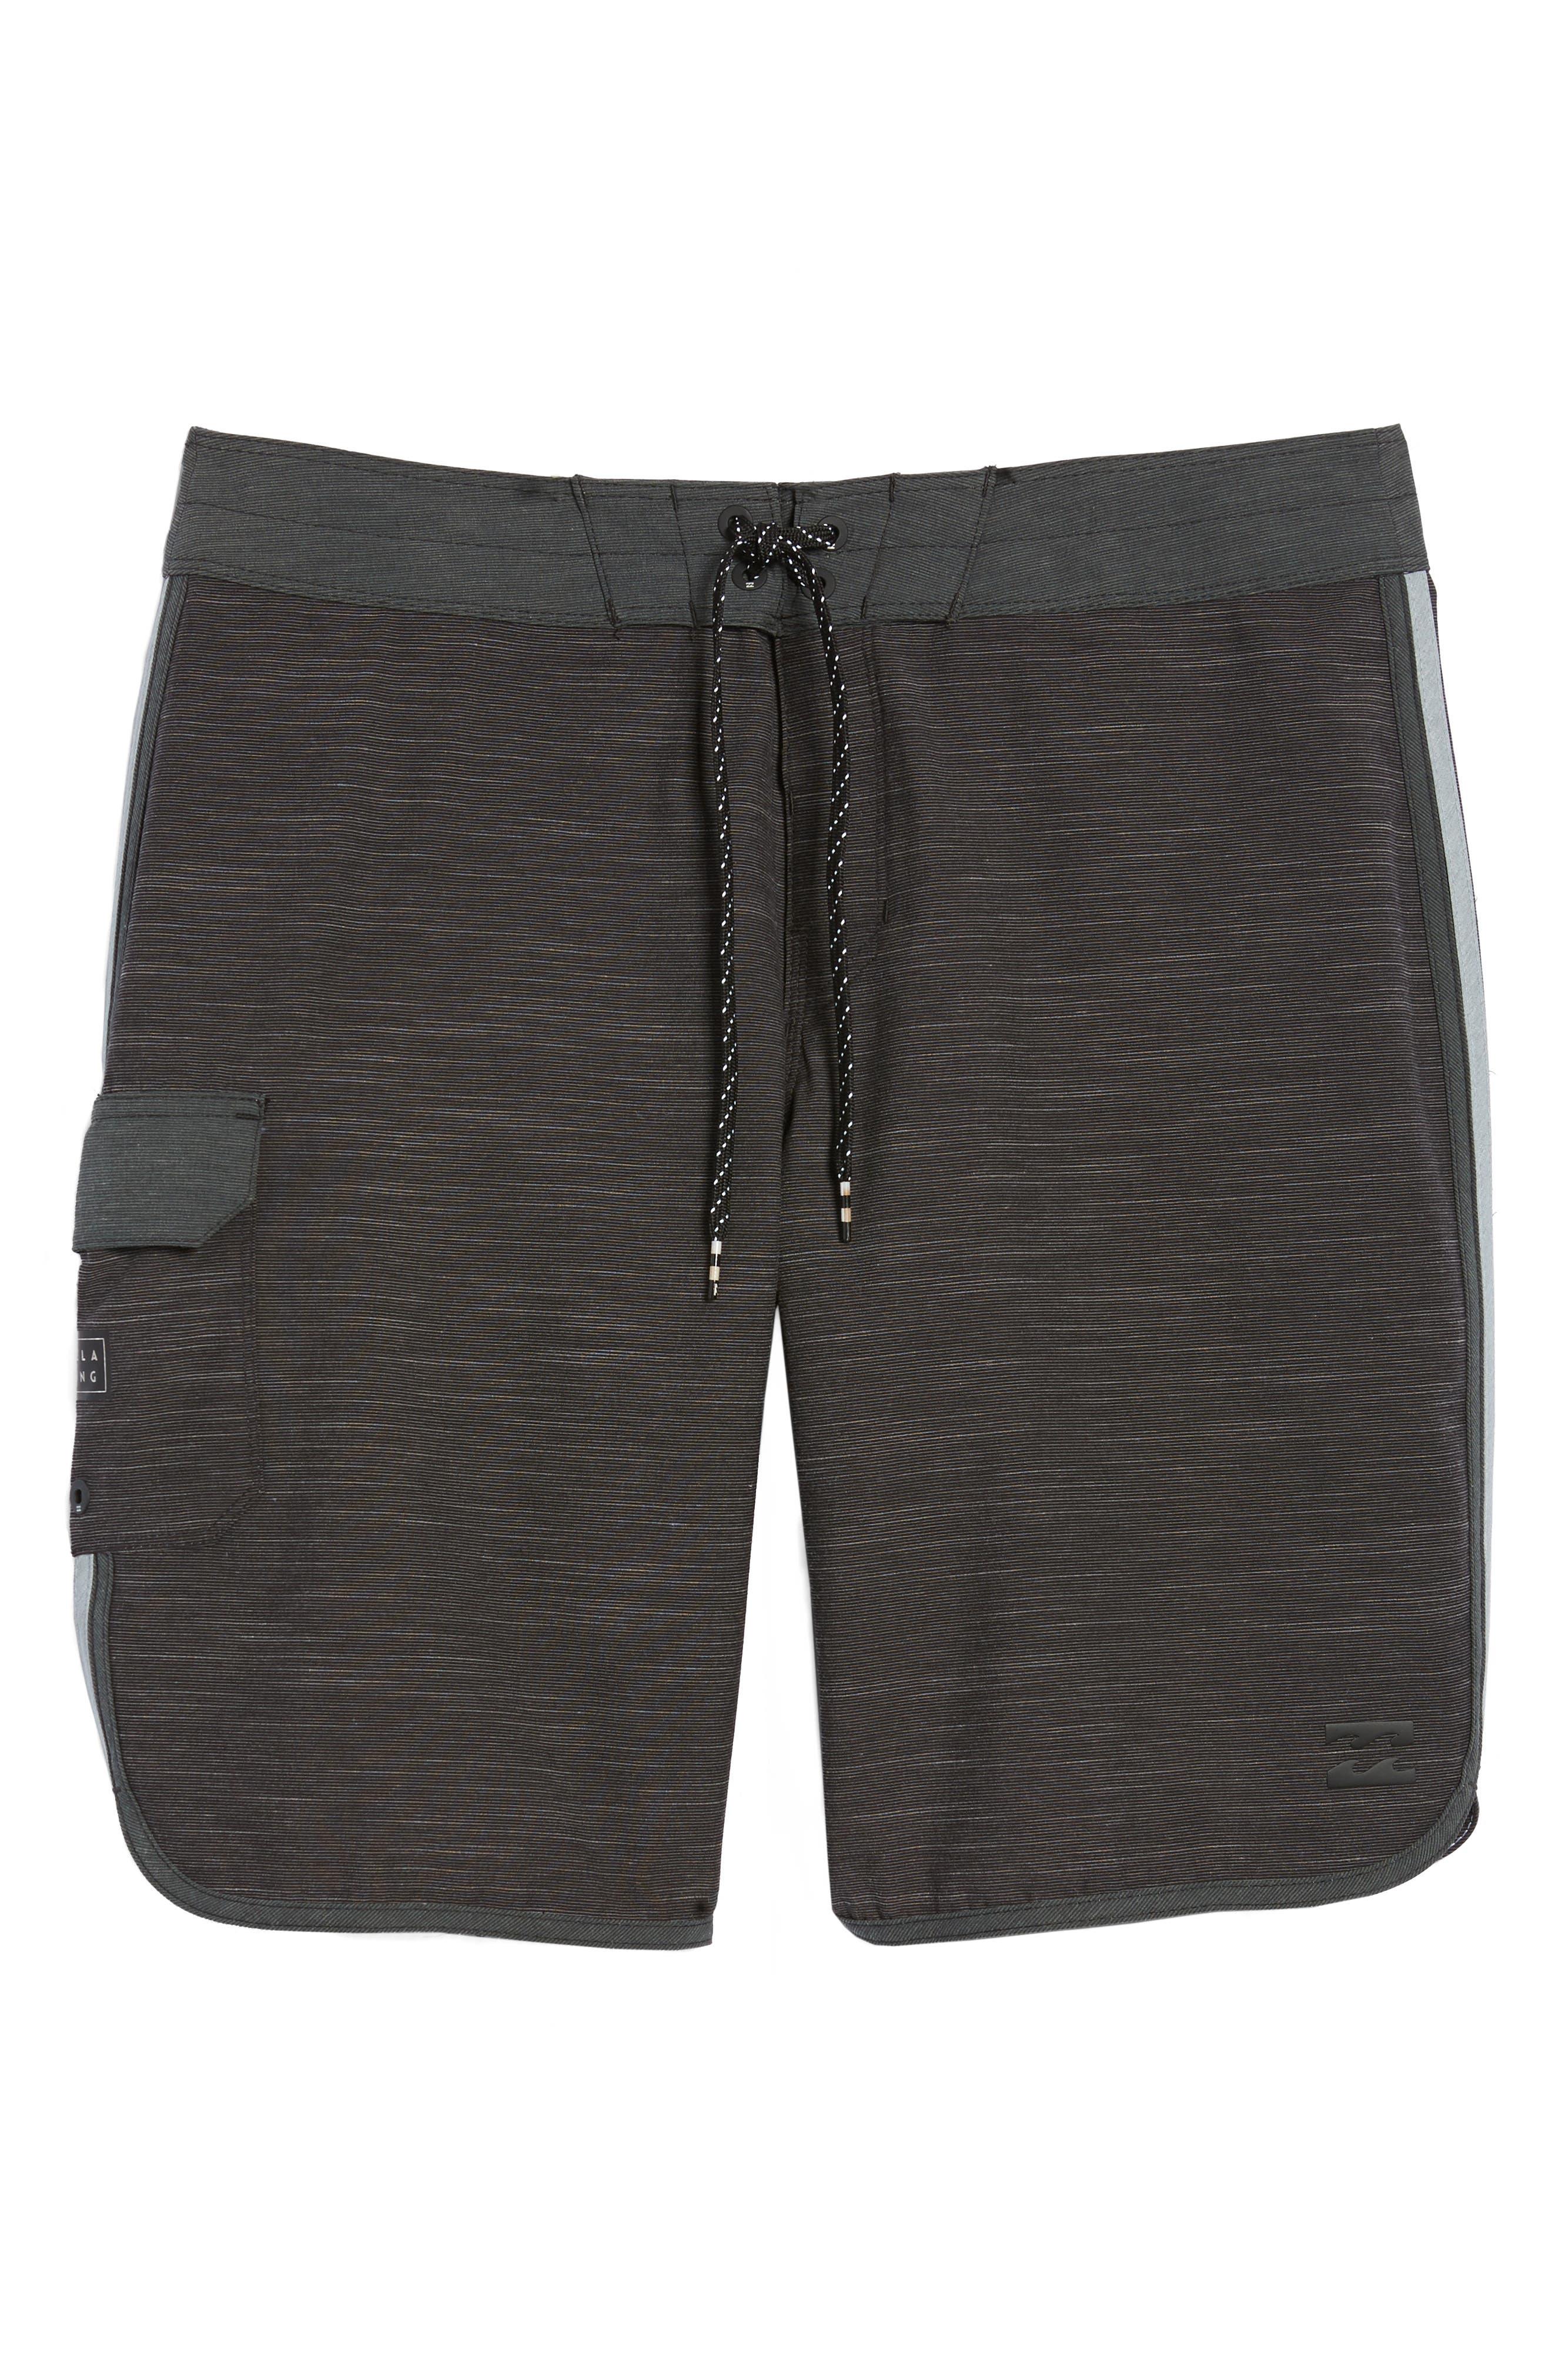 73 X Short Board Shorts,                             Alternate thumbnail 6, color,                             001